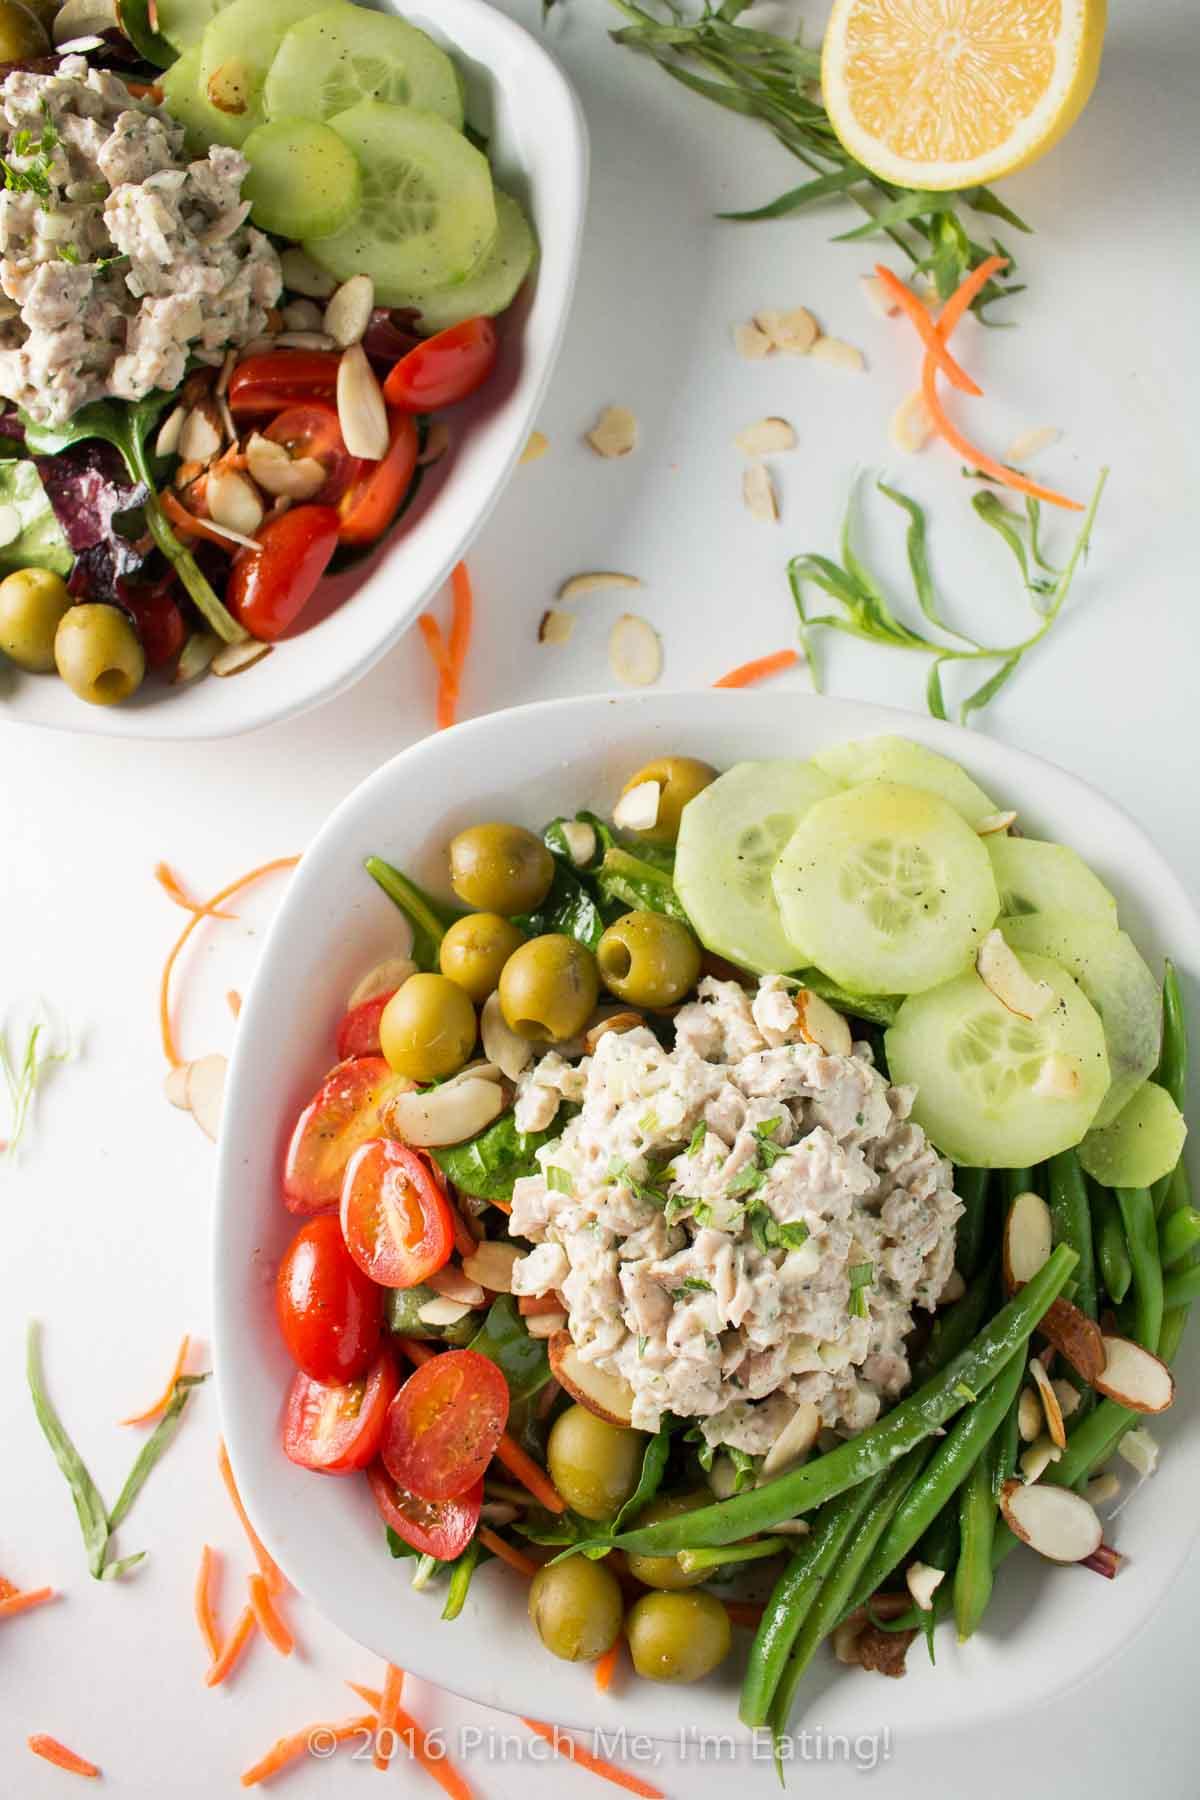 Montreal Chicken Salad